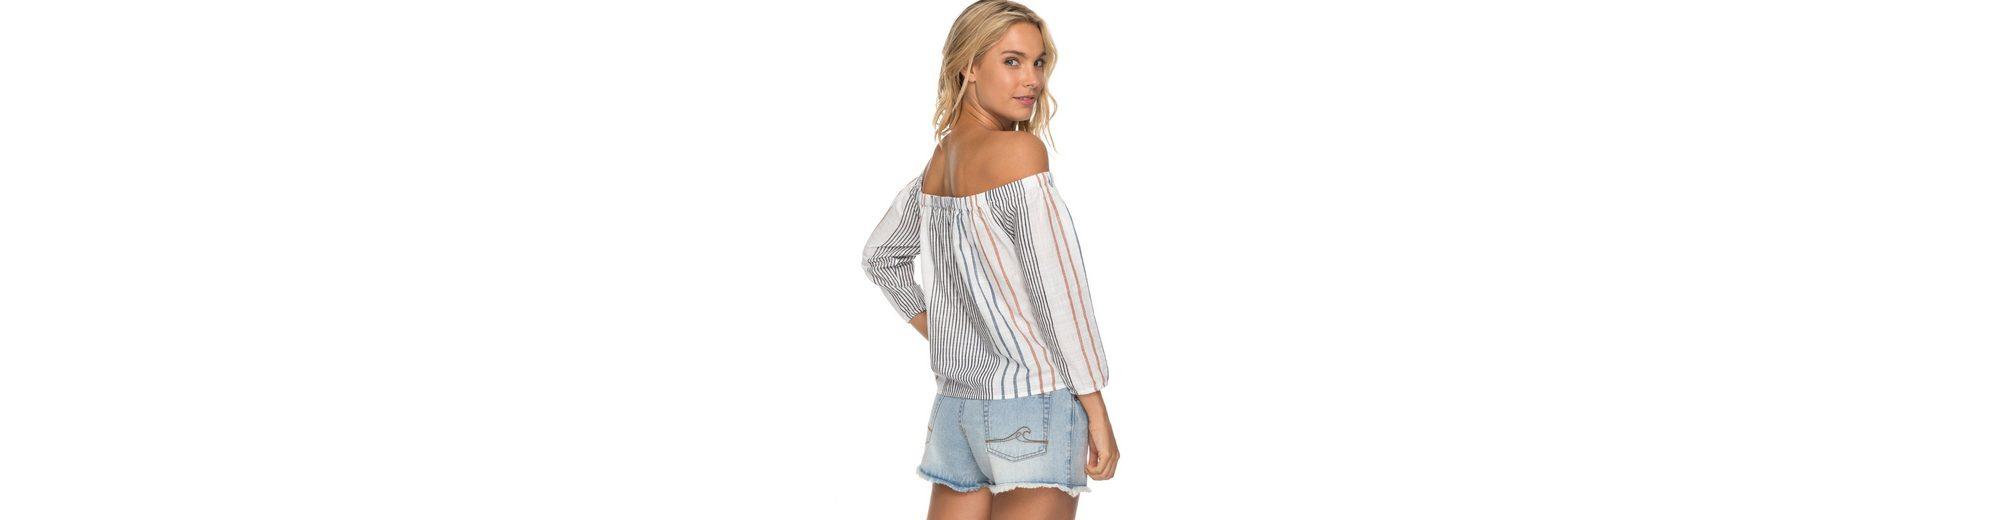 Roxy Schulterfreies Oberteil Crossing Stripes Online-Shopping Mit Mastercard tVSq6QiJni